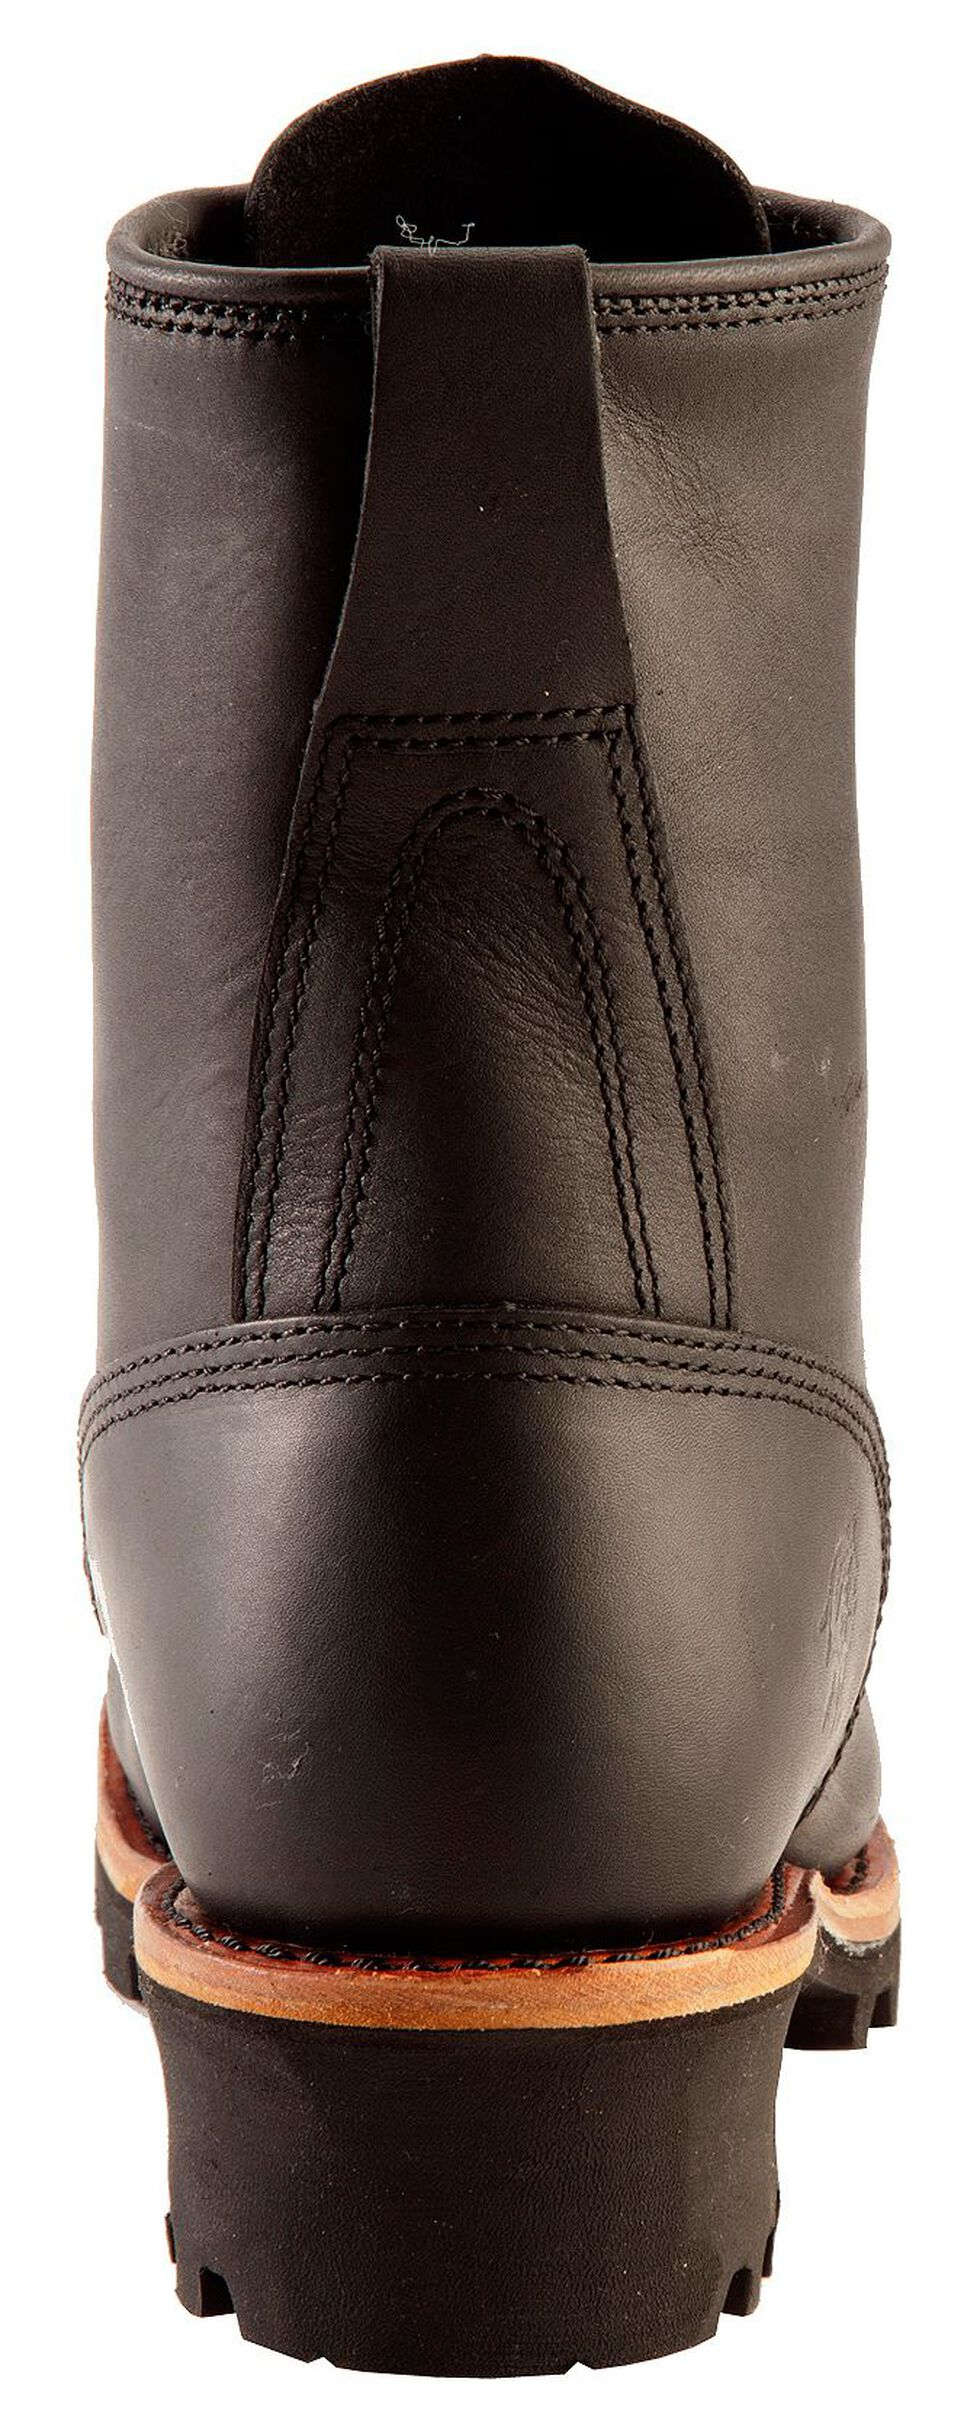 "Chippewa Men's Lace-Up 8"" Logger Boots - Composite Toe, , hi-res"